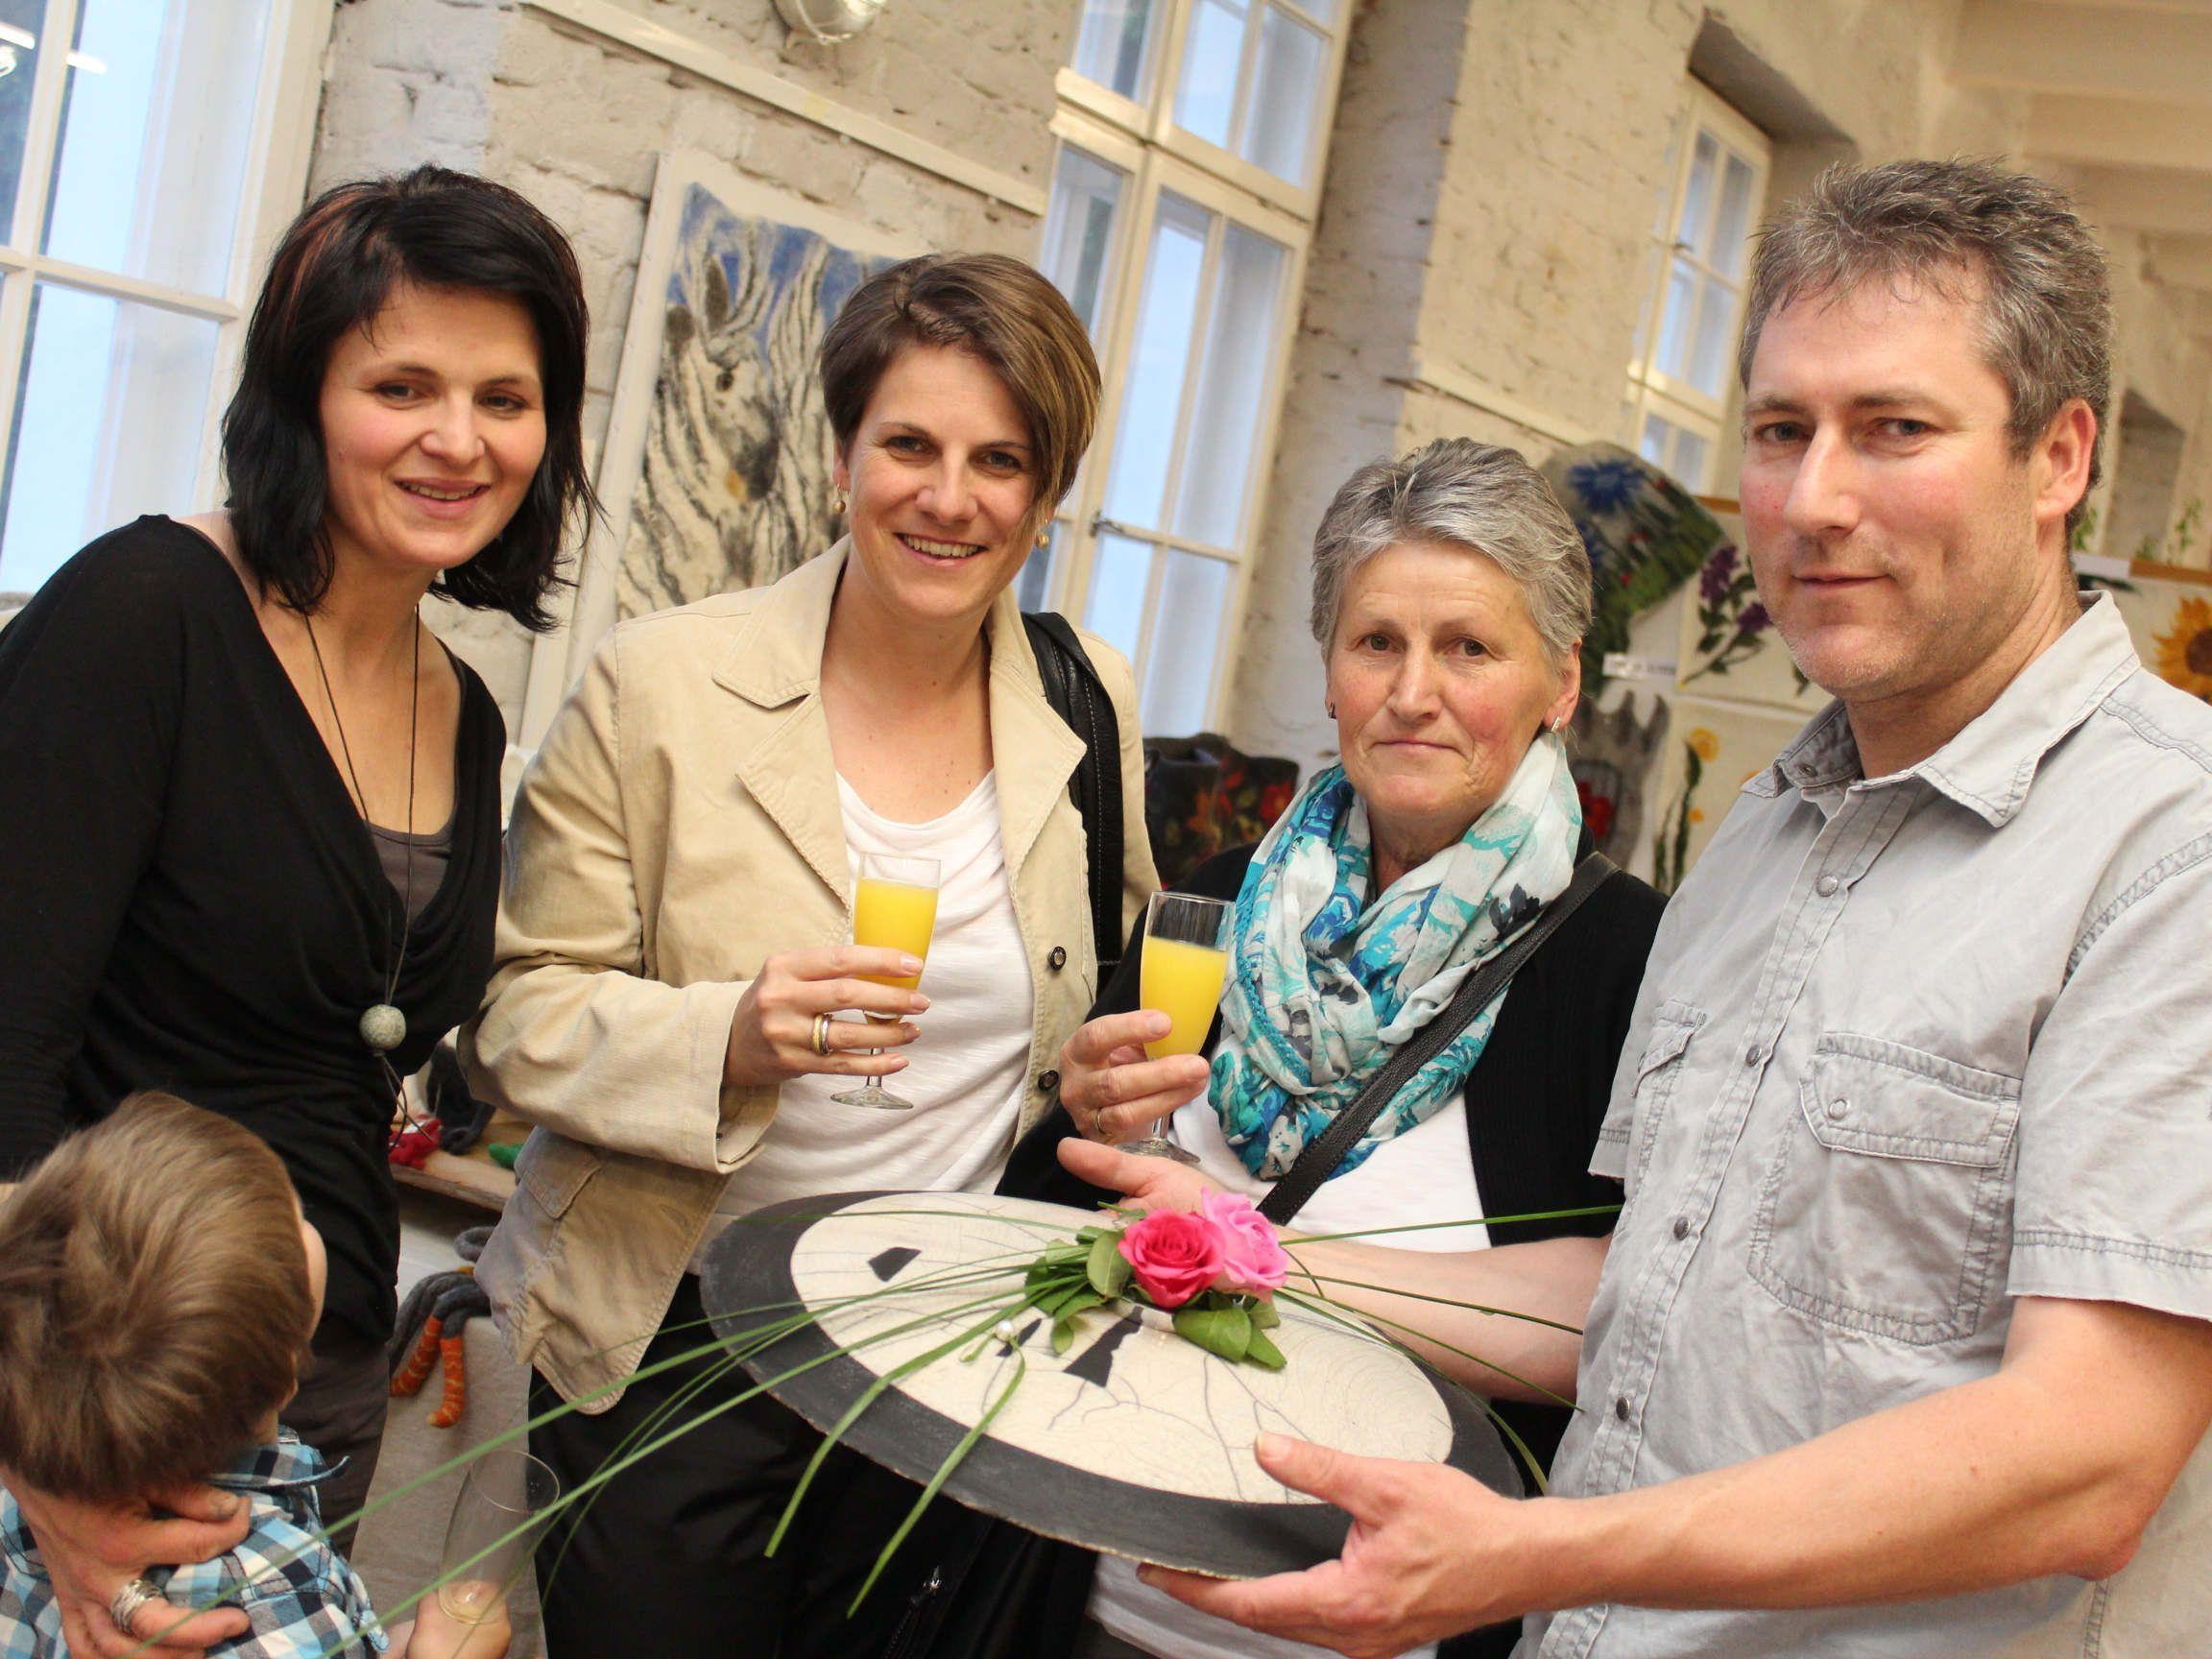 Simone Gmeiner-Stadelmann, Sandra und Sylvia Eberle, Gebhard Stadelmann.